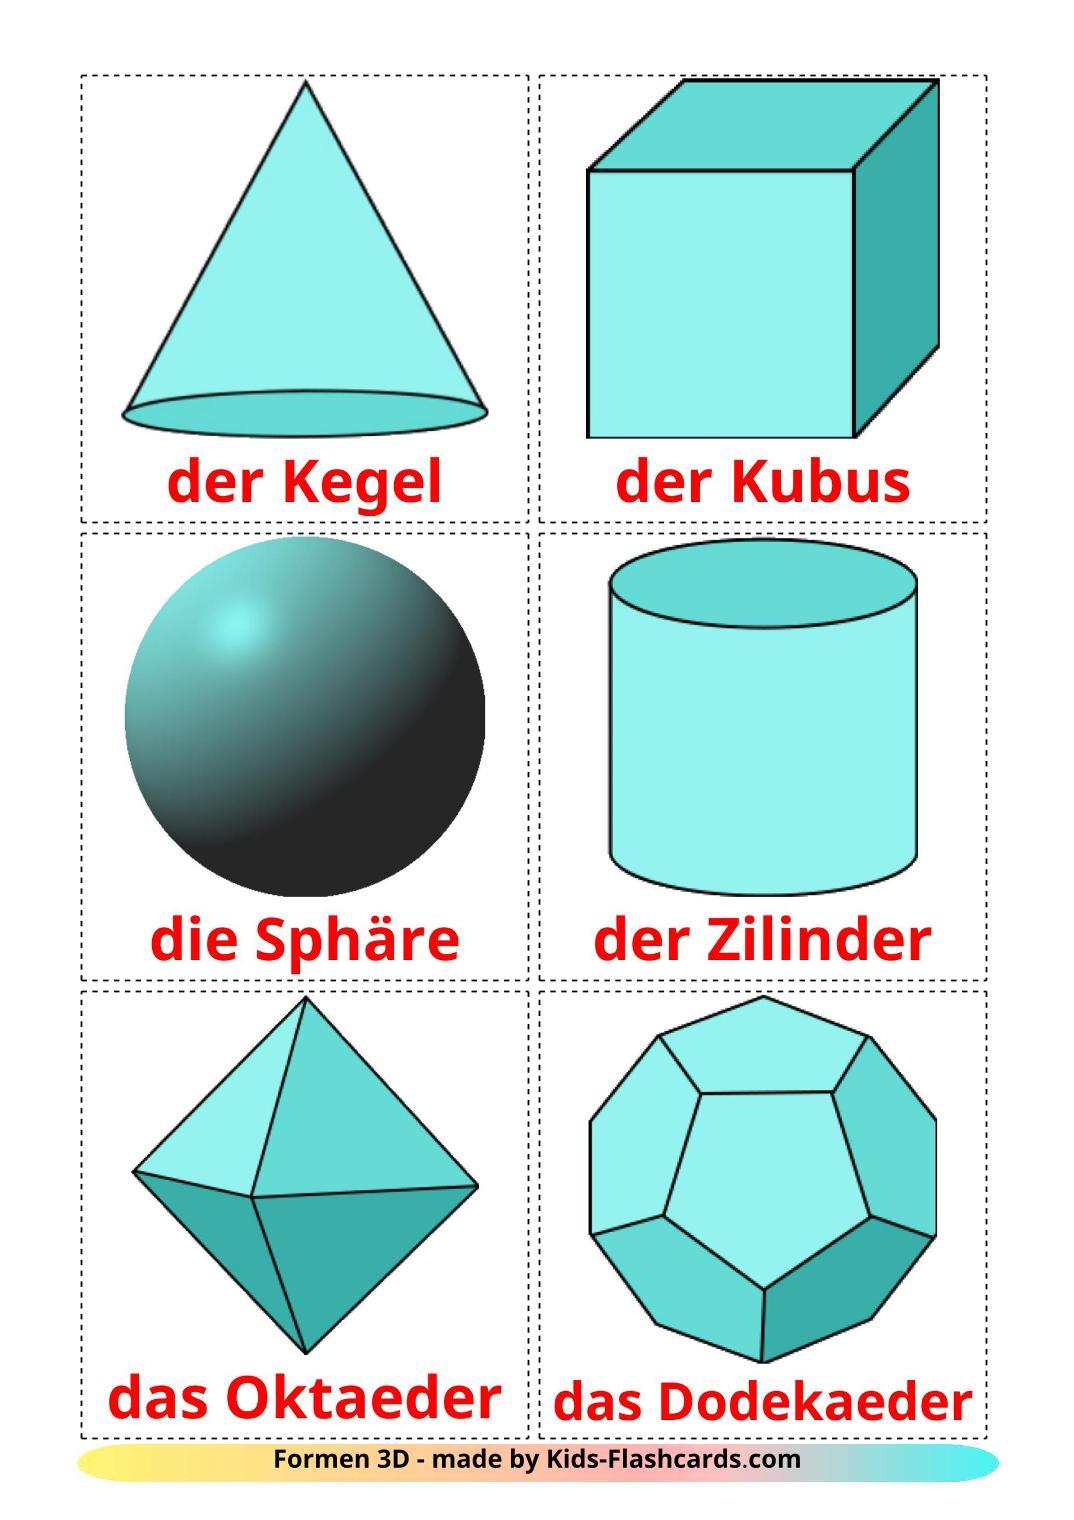 3D Shapes - 17 Free Printable german Flashcards